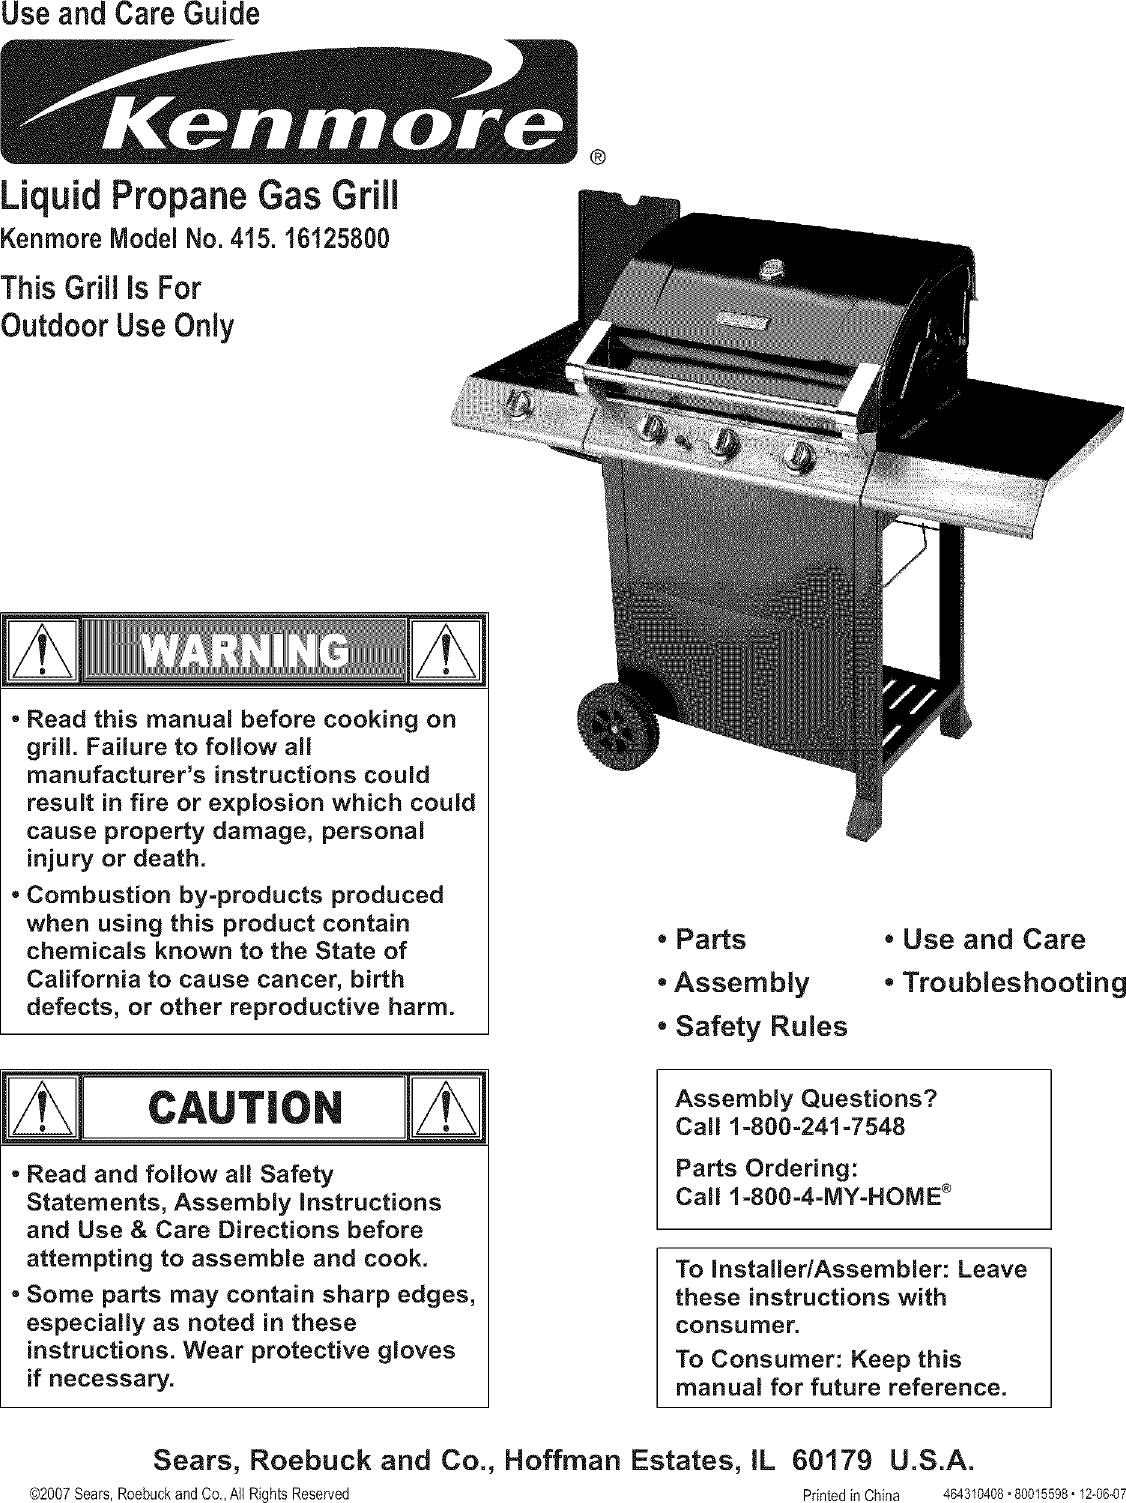 kenmore 41516125800 user manual liquid propane gas grill manuals and rh usermanual wiki kenmore gas grill burner assembly kenmore 4 burner gas grill manual